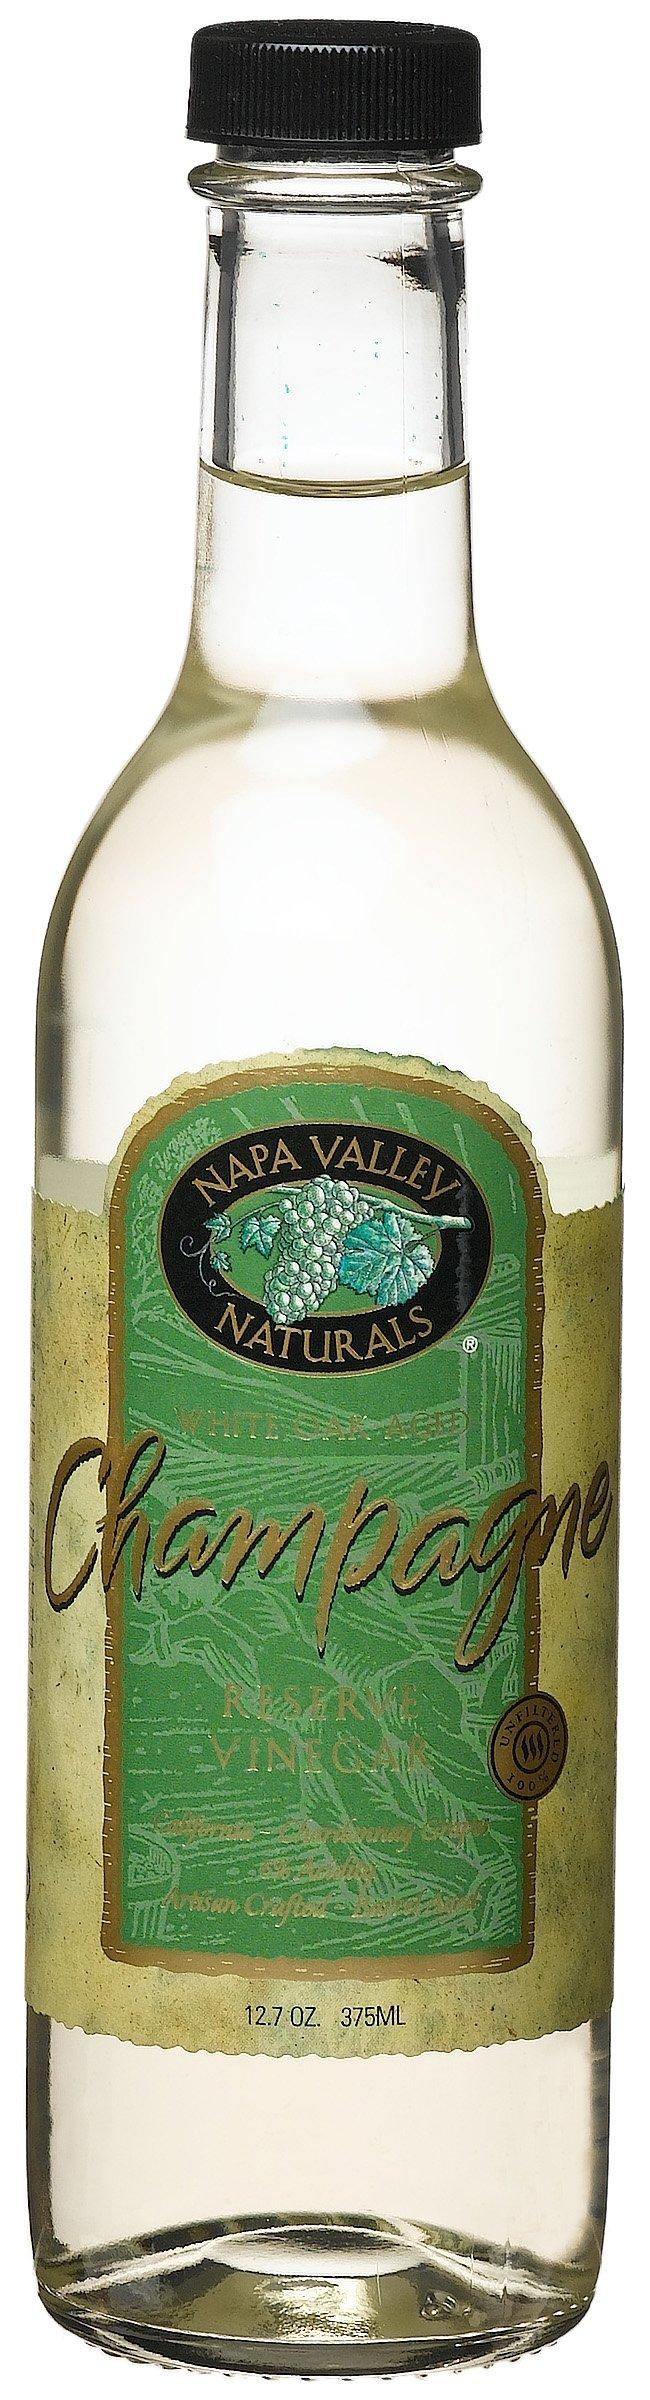 Napa Valley, Champagne Vinegar, 12.7 oz